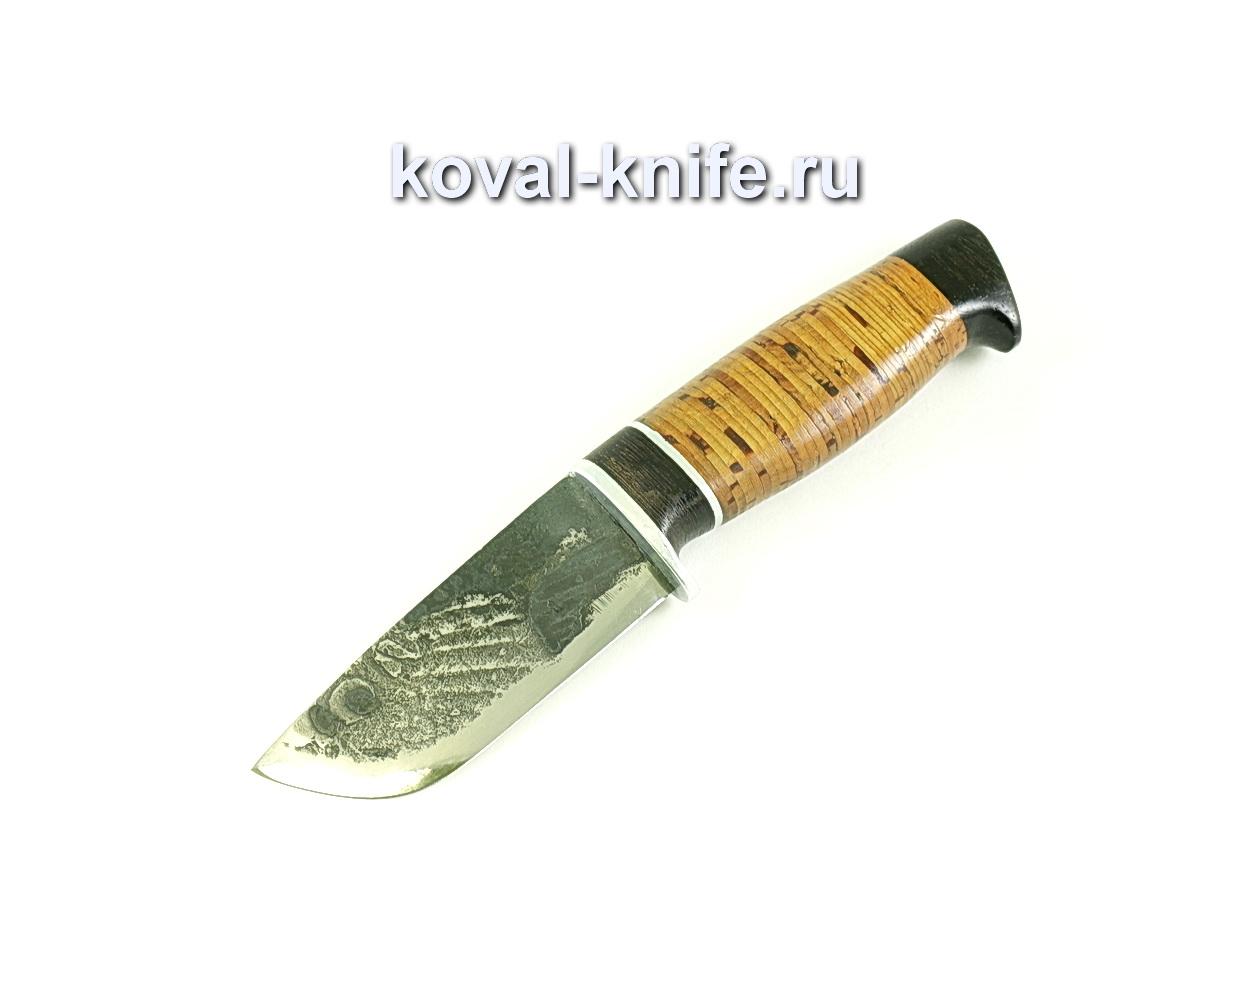 Нож Бобр (сталь 9хс), рукоять граб, береста A105